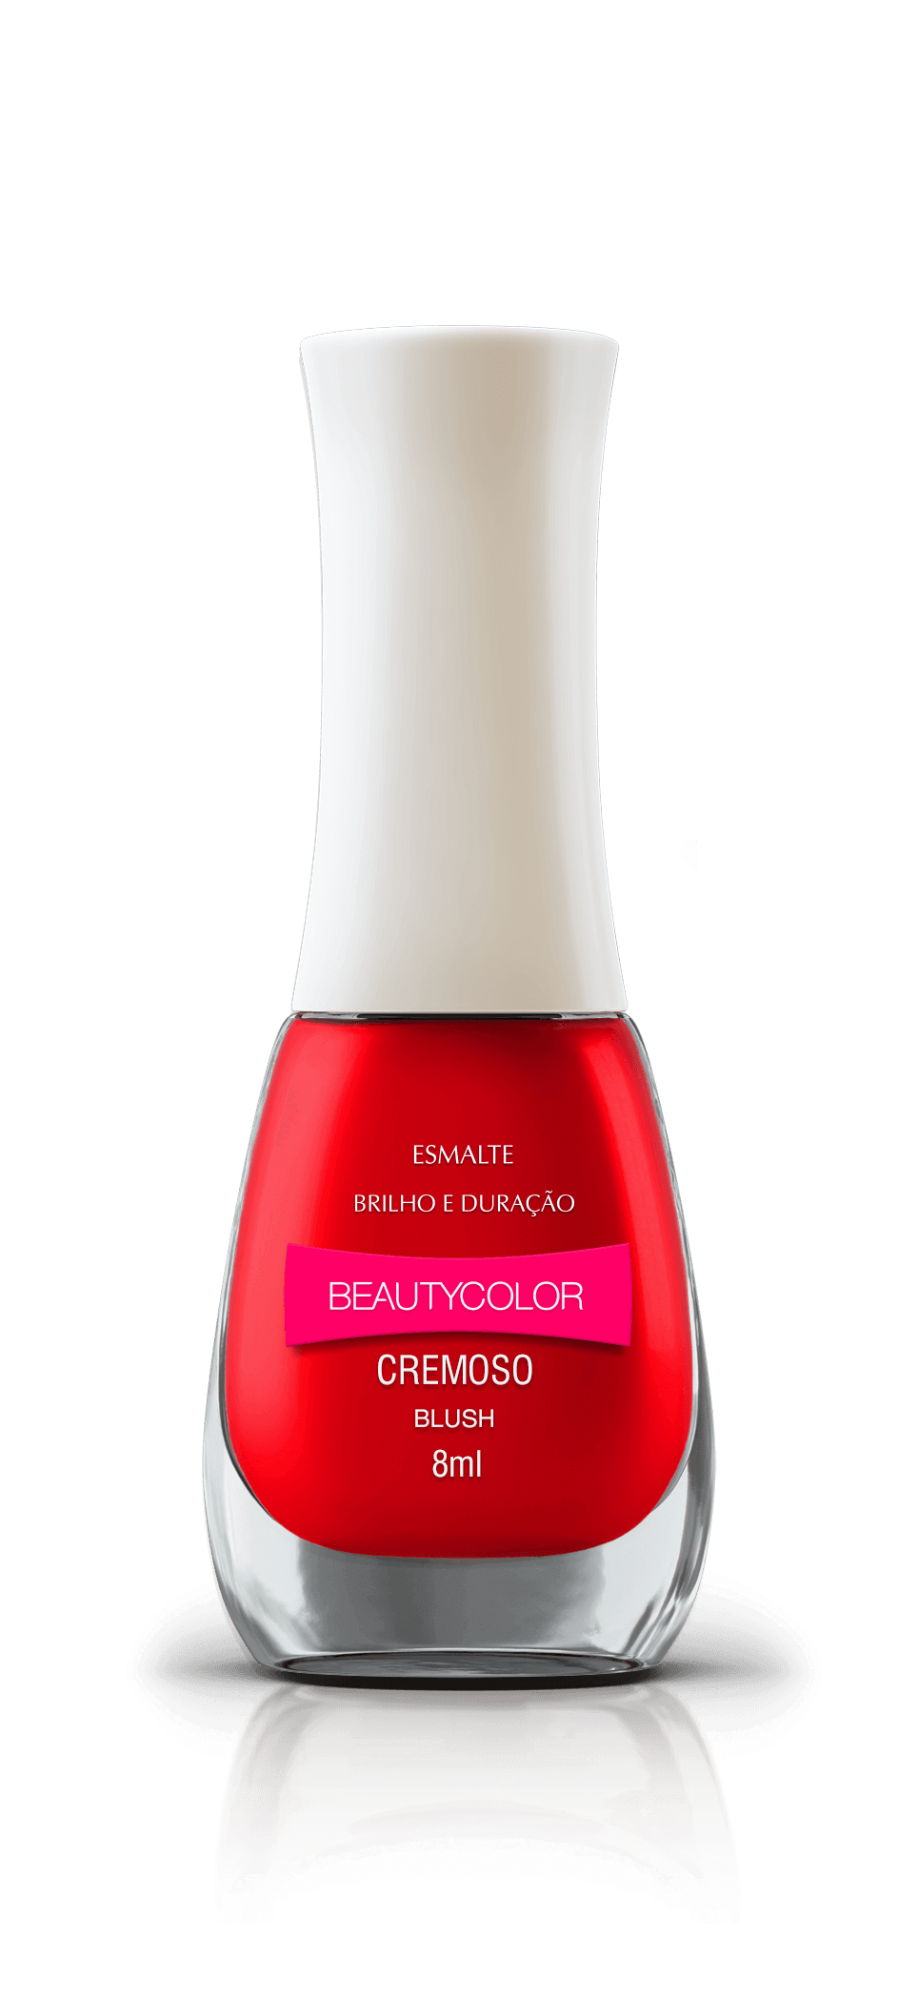 Blush - Esmalte Beautycolor